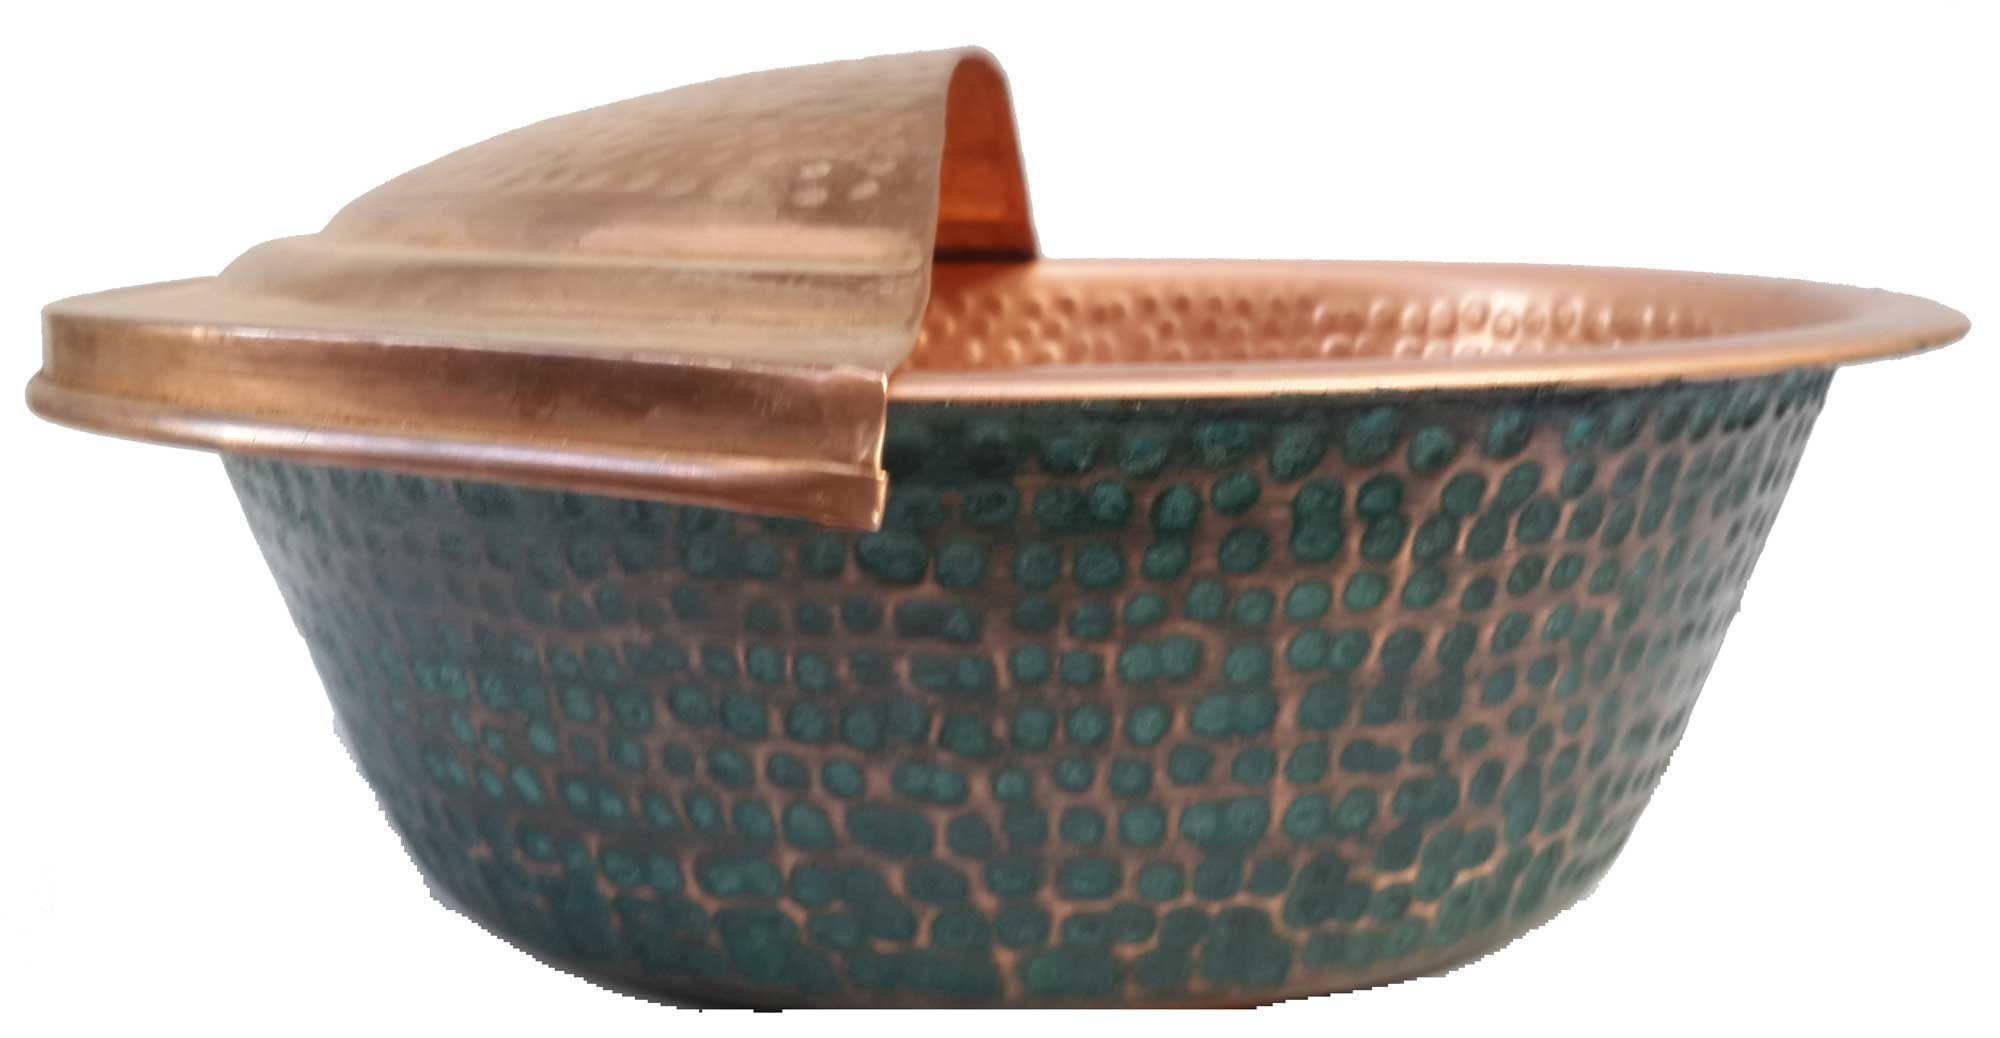 Egypt gift shops Verdigris Gold Double Finish Foot Soaking Massage Bath Bucket Pedi Tub Spa Pedicure Bowl + Rest